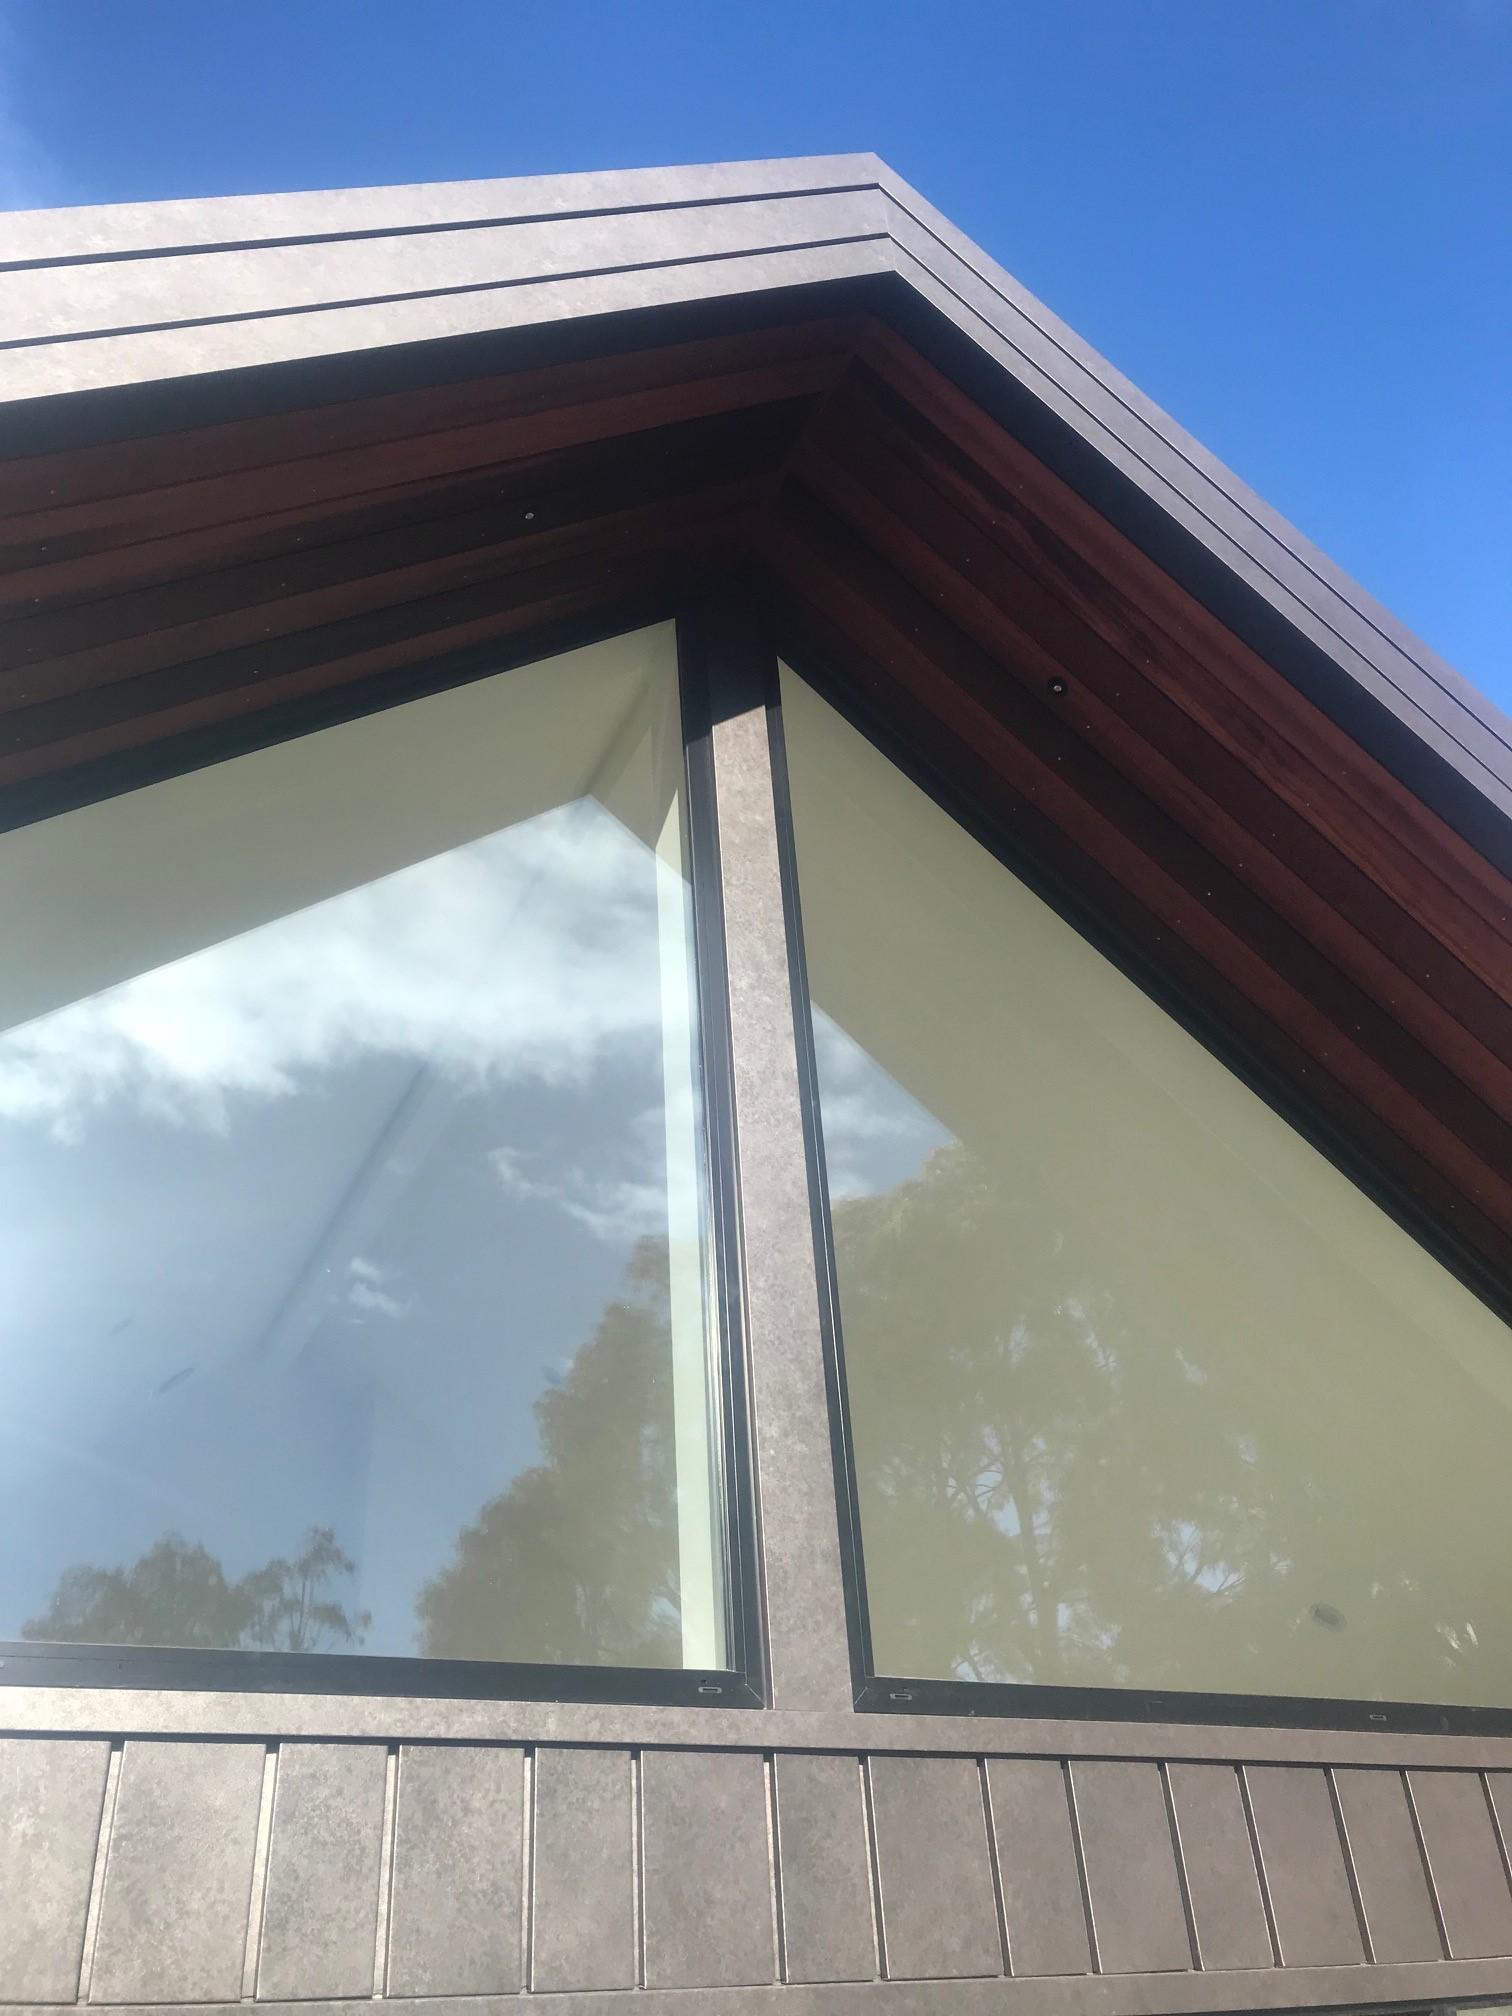 The-Roofing-Store-Steel-Metal-Interlocking-Panel-Lux-Corten-Dark-5.jpg.jpg